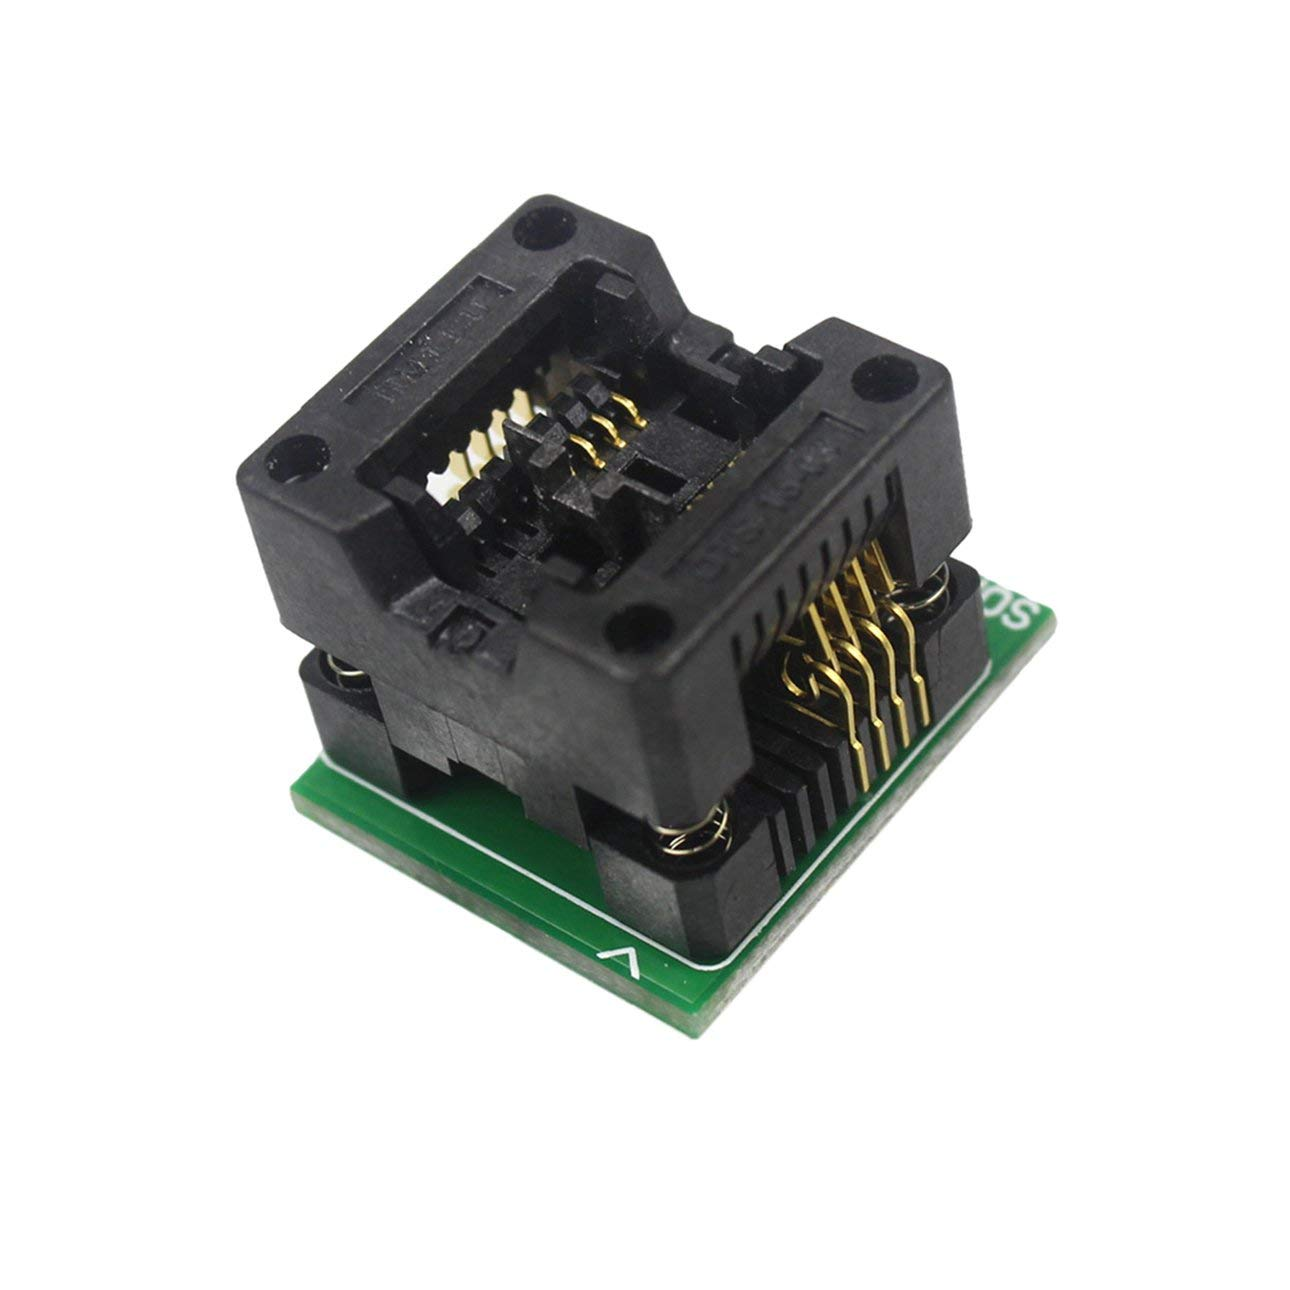 Liobaba SOP8 to DIP8 Wide-Body Seat Wide 200mil Programmer Adapter Socket Converter Module for All-11 Series LT-48 Series